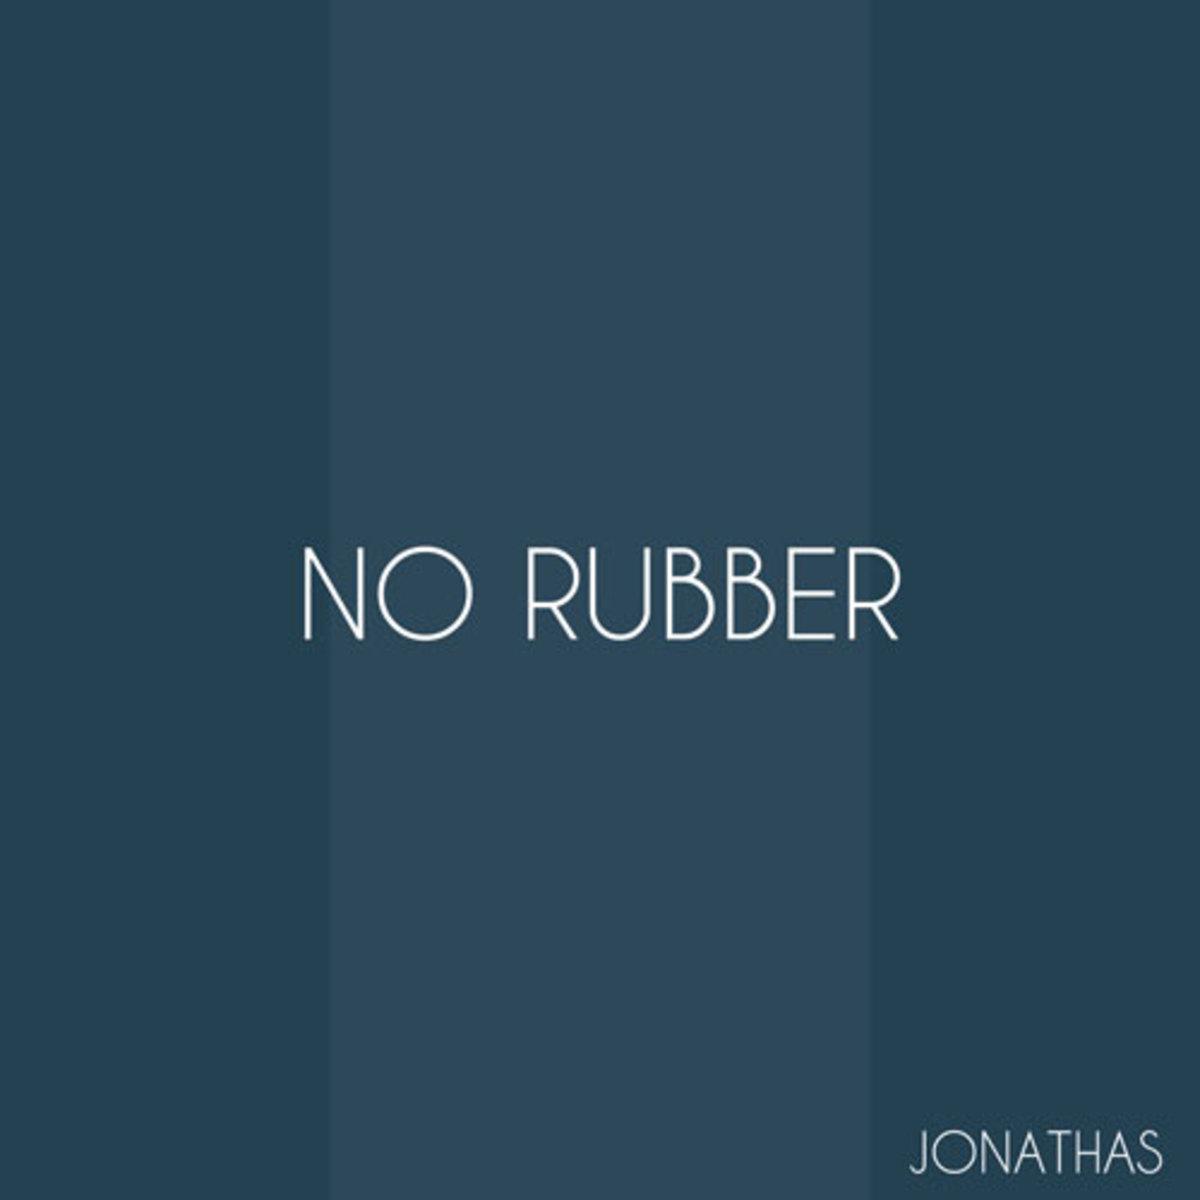 jonathas-norubber.jpg